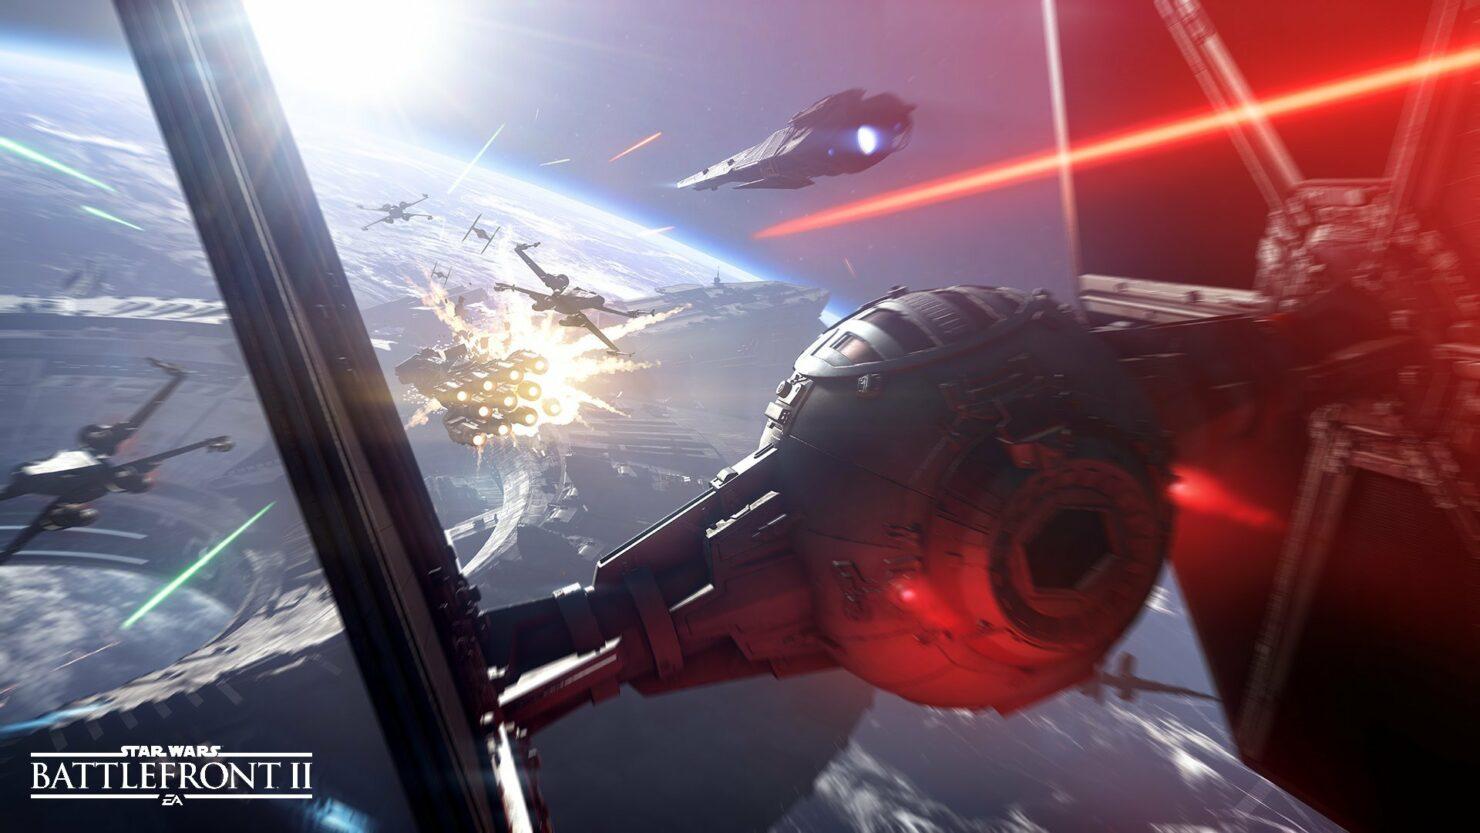 Star Wars Battlefront II xbox one patch